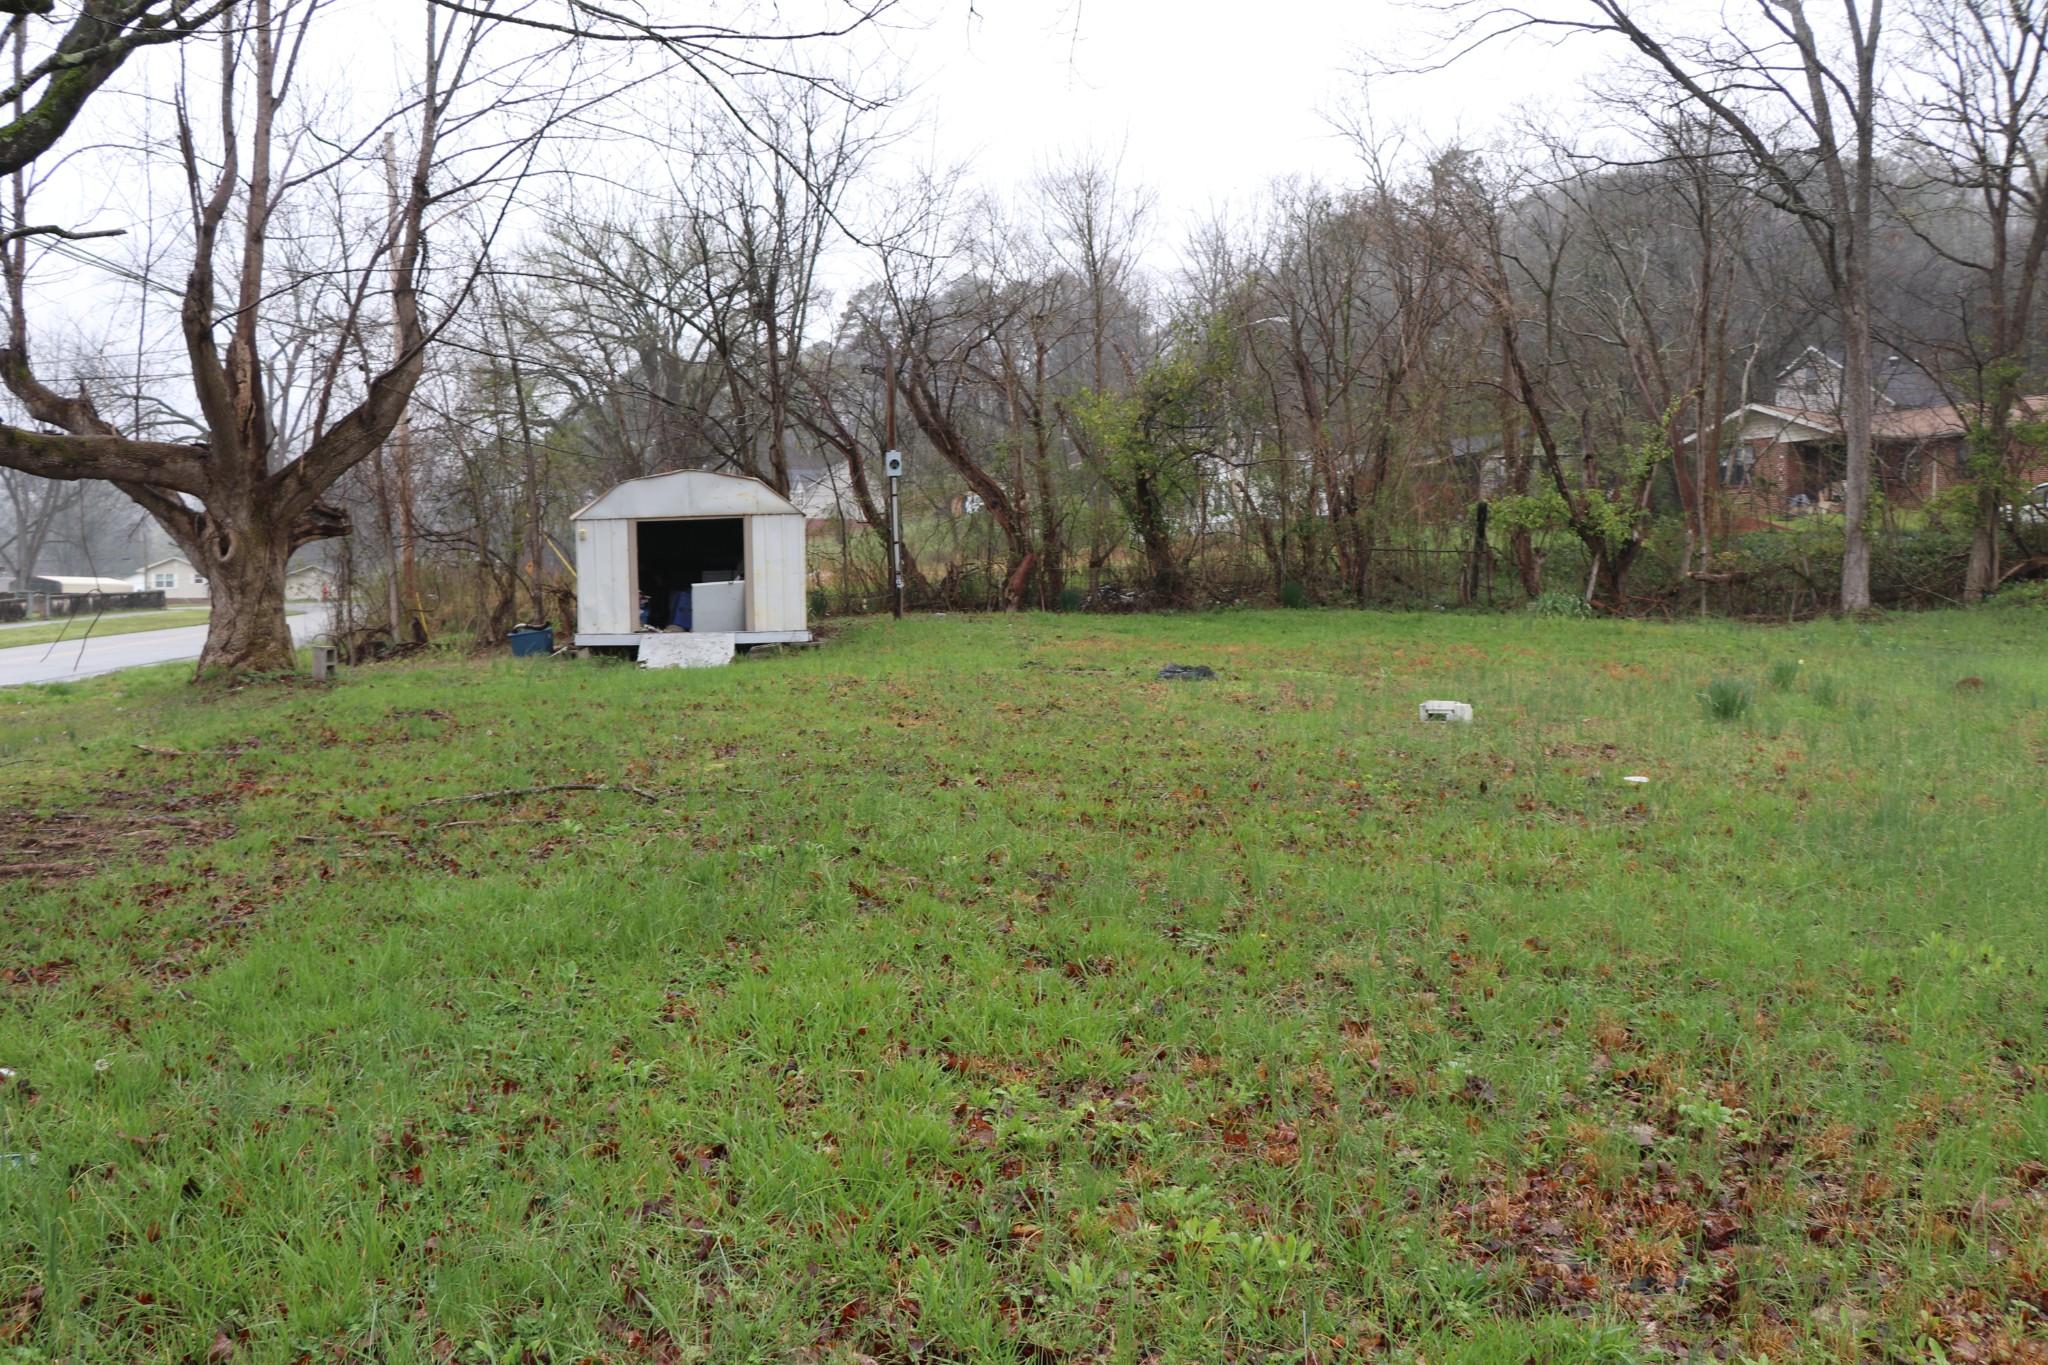 504 1st St, South Pittsburg, TN 37380 - South Pittsburg, TN real estate listing